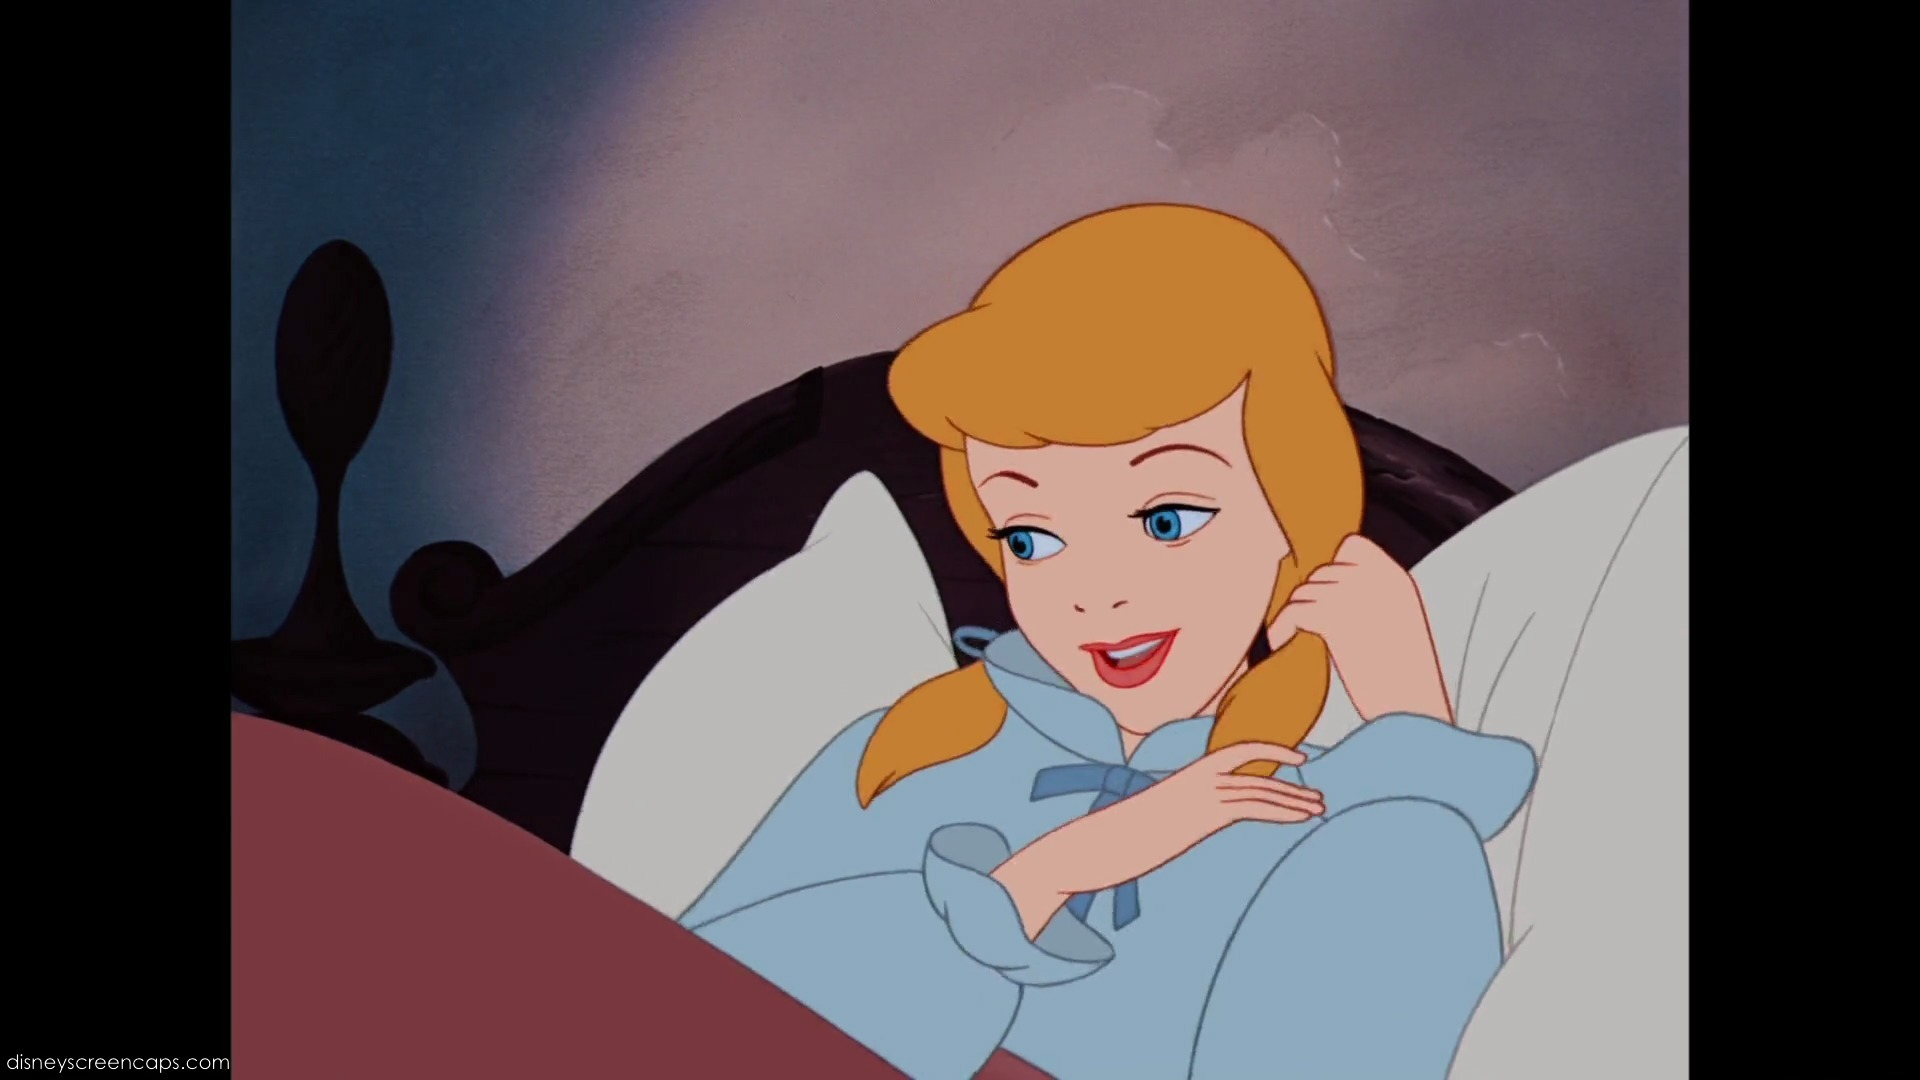 i Hate Cinderella so so Much